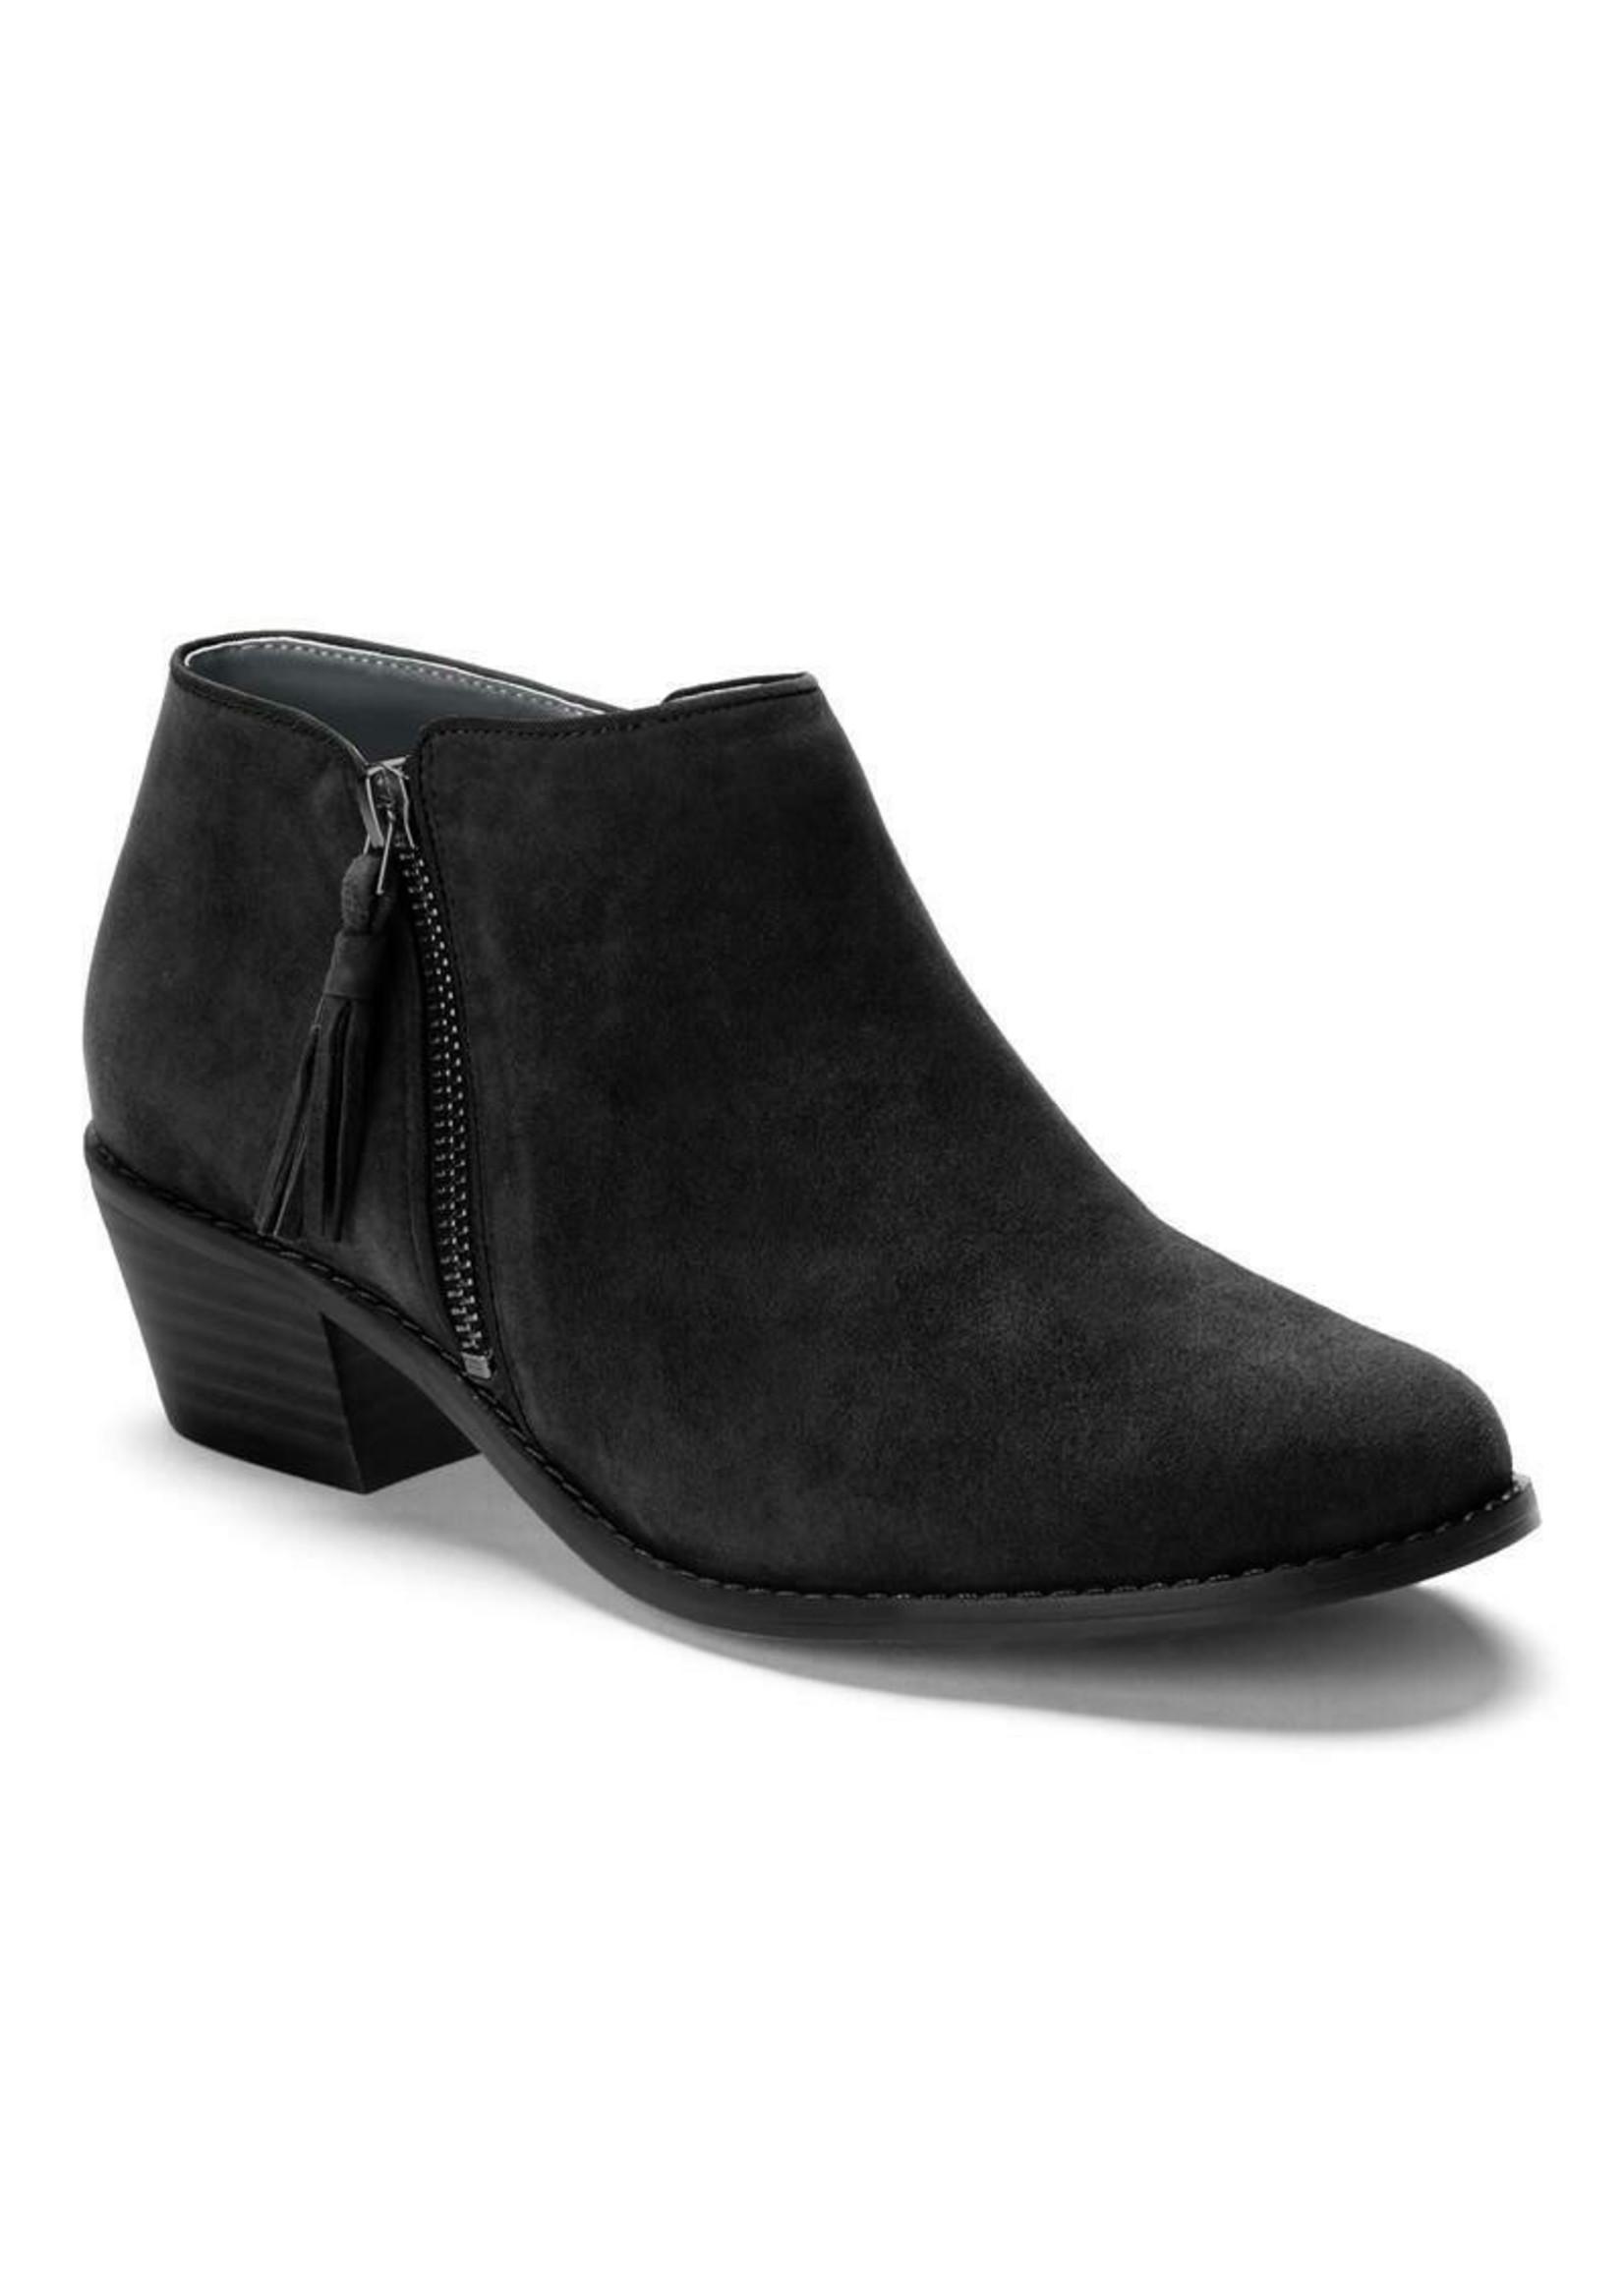 Vionic Joy Jolene - Ankle Boot